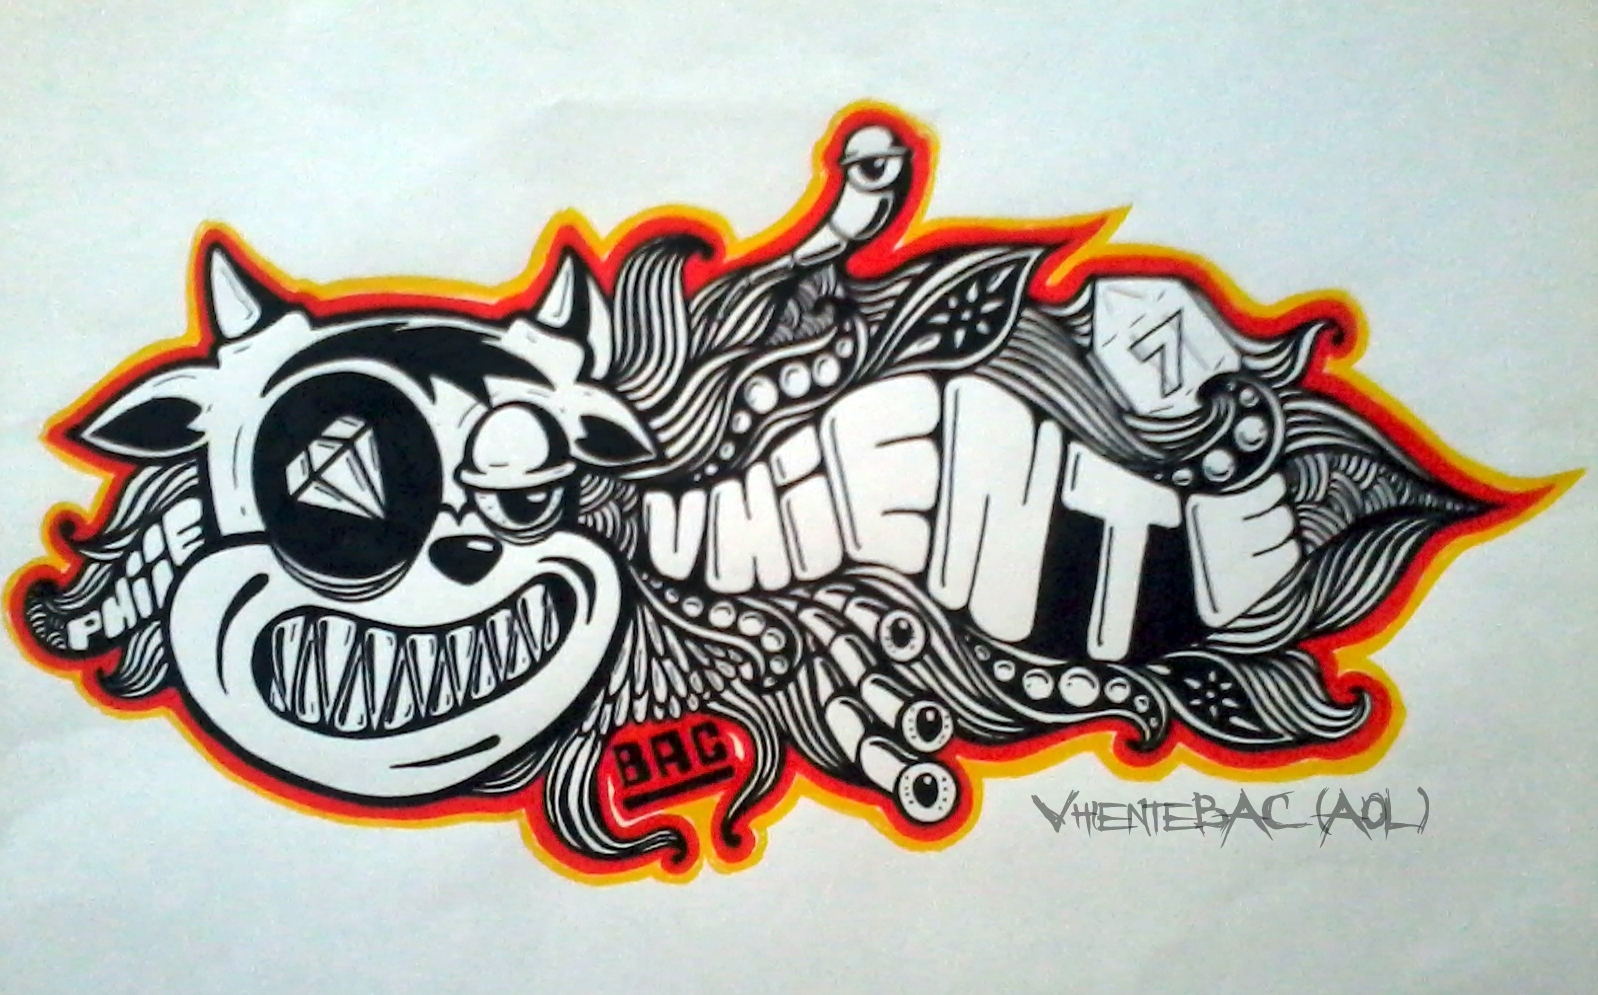 Tag grafiti gambar kertassketsa grafiti gambar kertasgambar grafiti dengan spidol warna sketsa muralsketsa charakter grafitibluphymummy